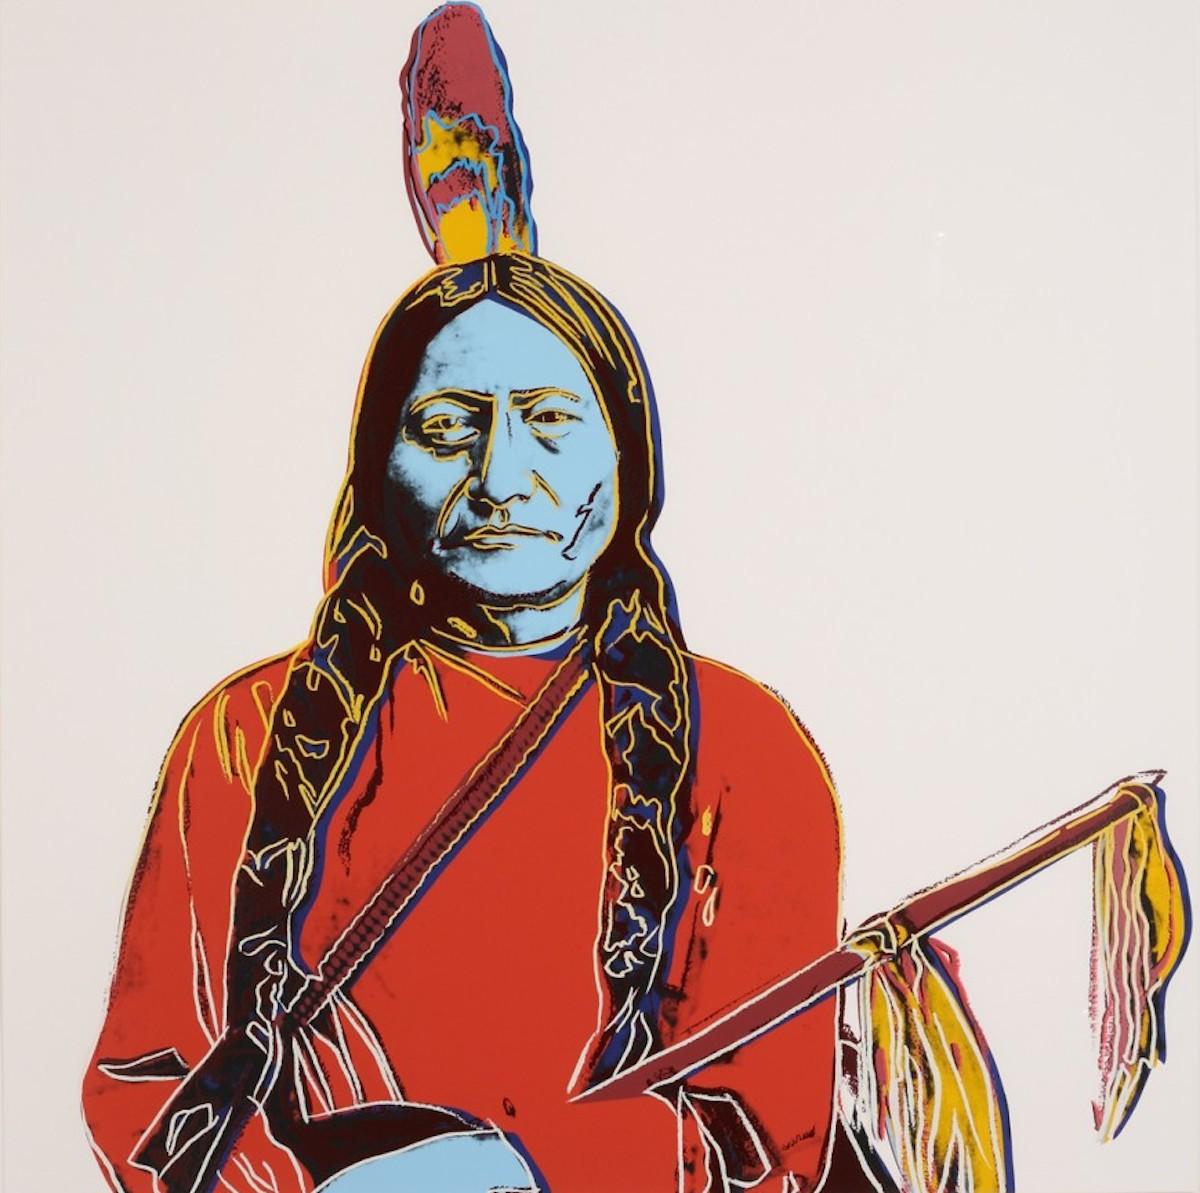 Sitting Bull by Andy Warhol